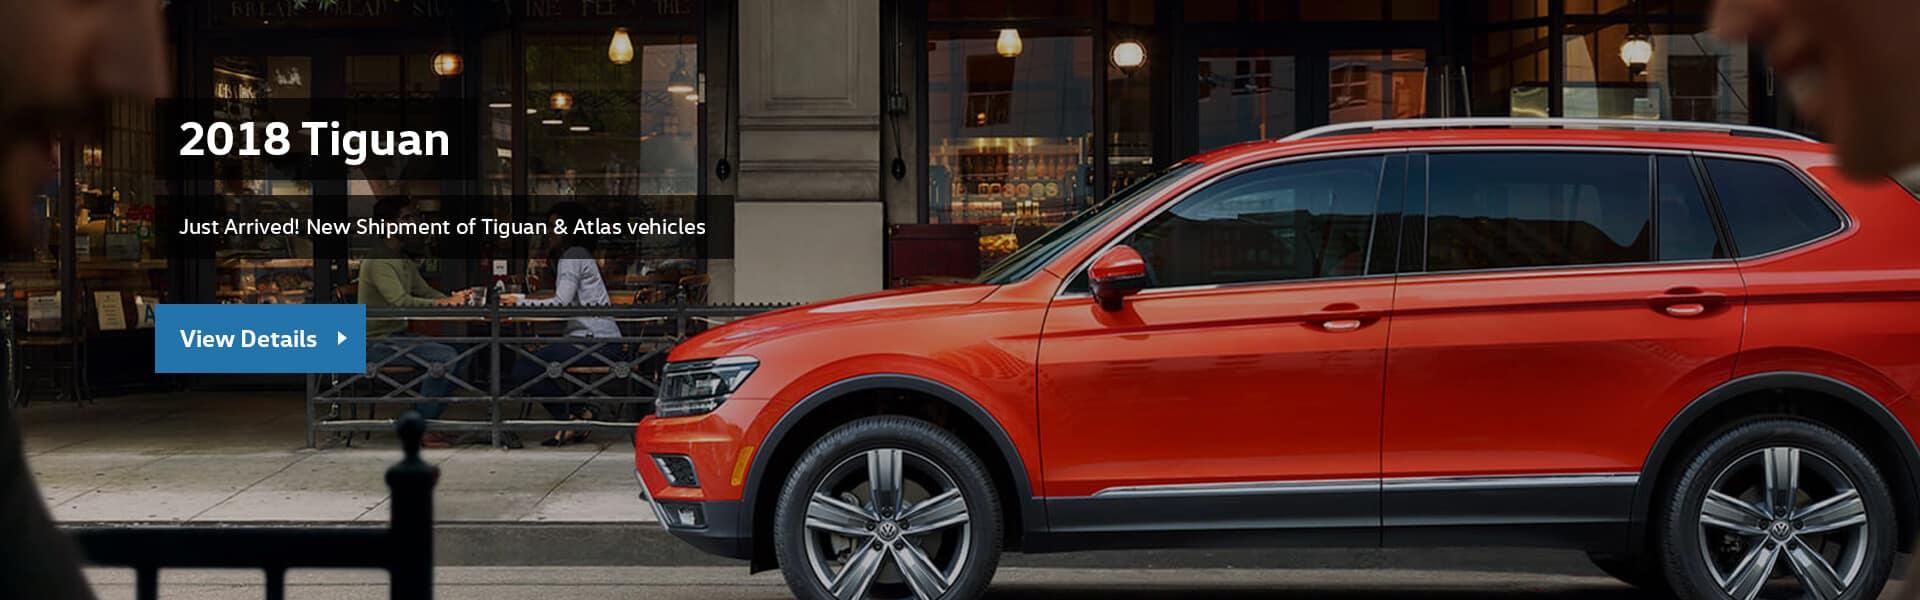 2018 Tiguan, Cowell Volkswagen in Richmond, Metro Vancouver, car dealership